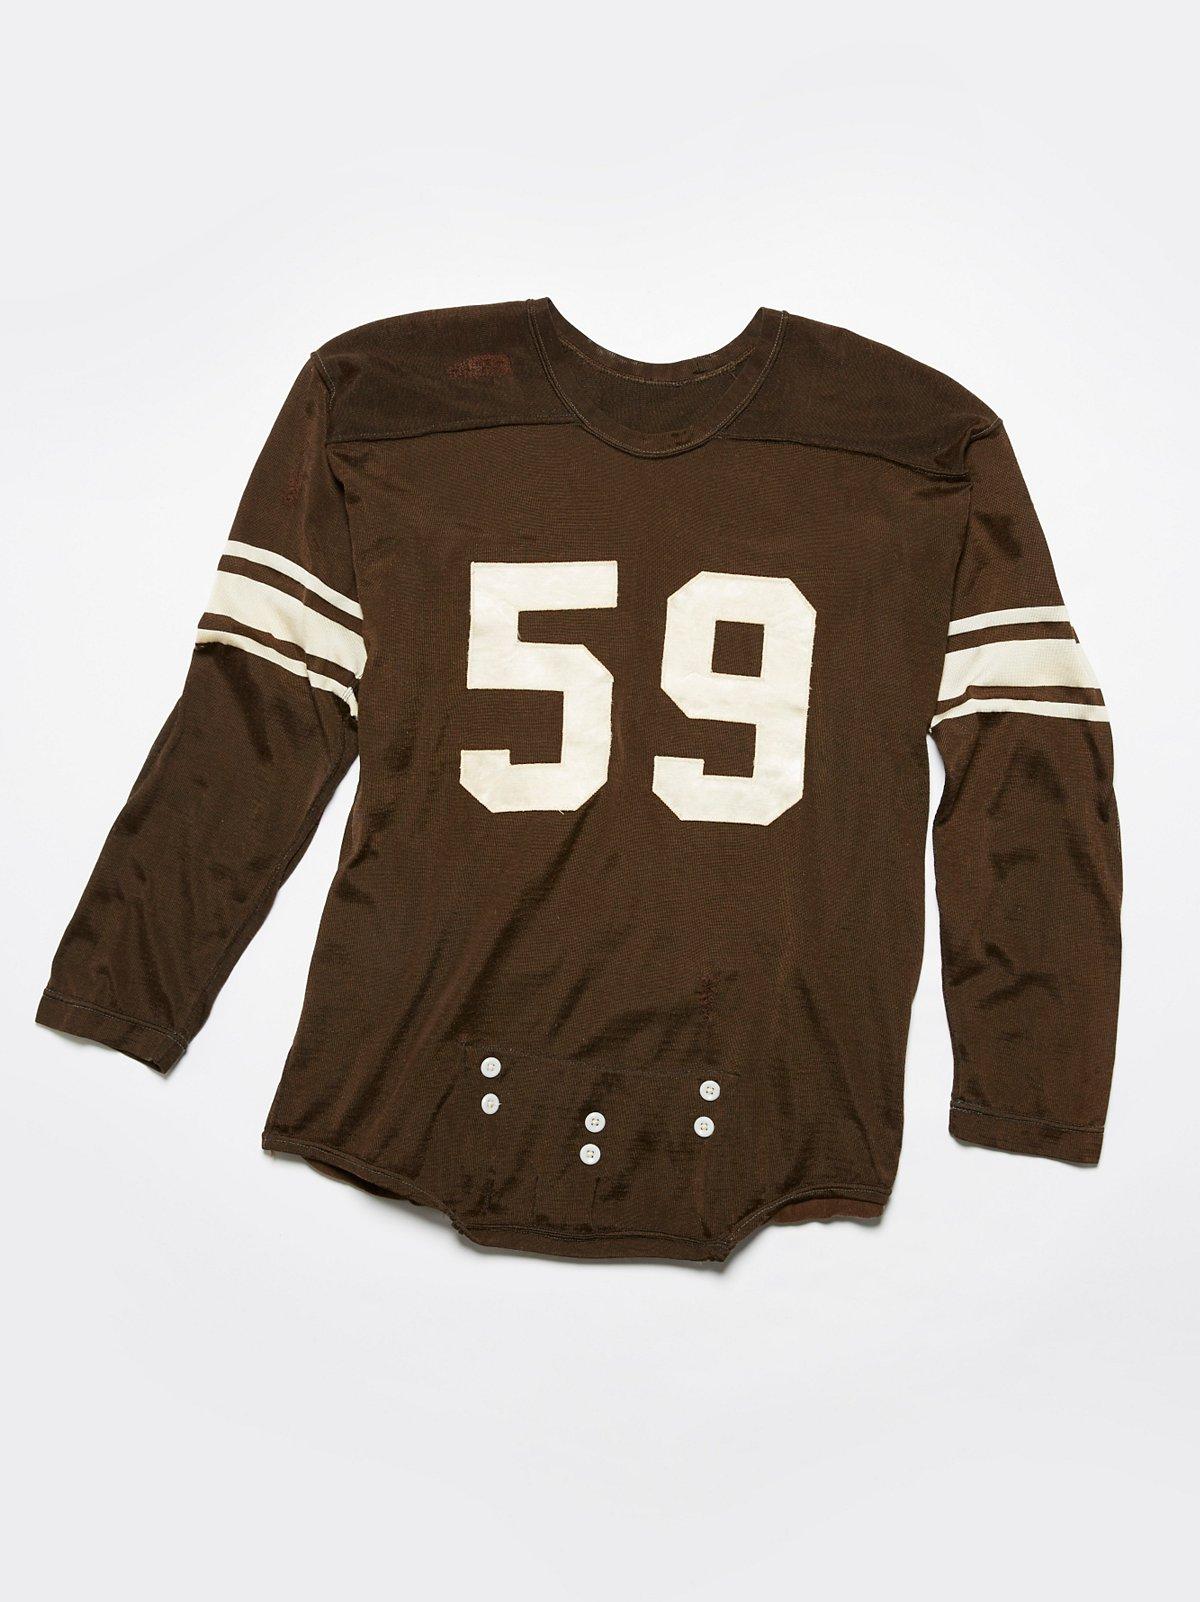 Vintage 1970s Football Jersey